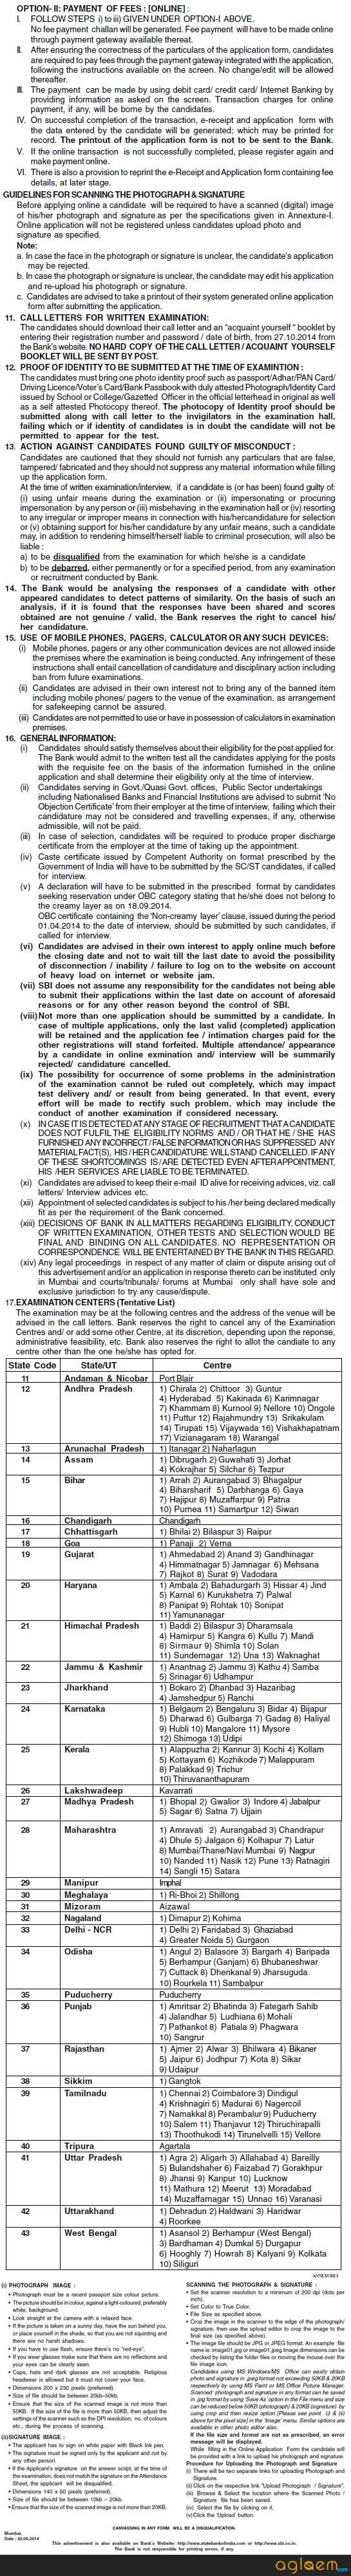 SBI Associate Bank PO Recruitment 2014 Notification Part 3